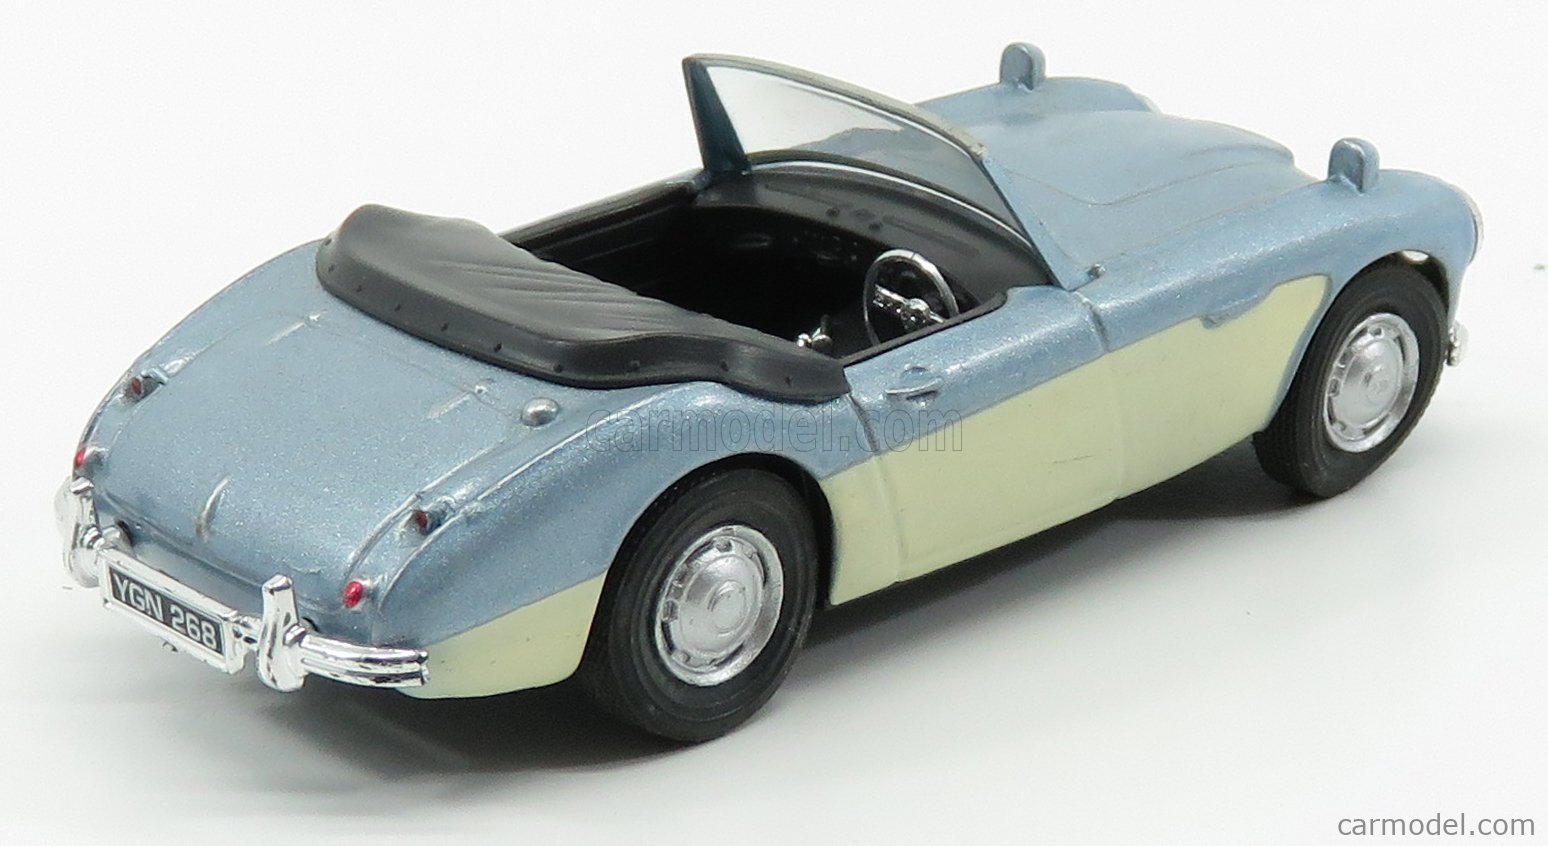 HONGWELL 16240 Echelle 1/43  AUSTIN HEALEY 3000 MKIII SPIDER OPEN 1964 LIGHT BLUE CREAM